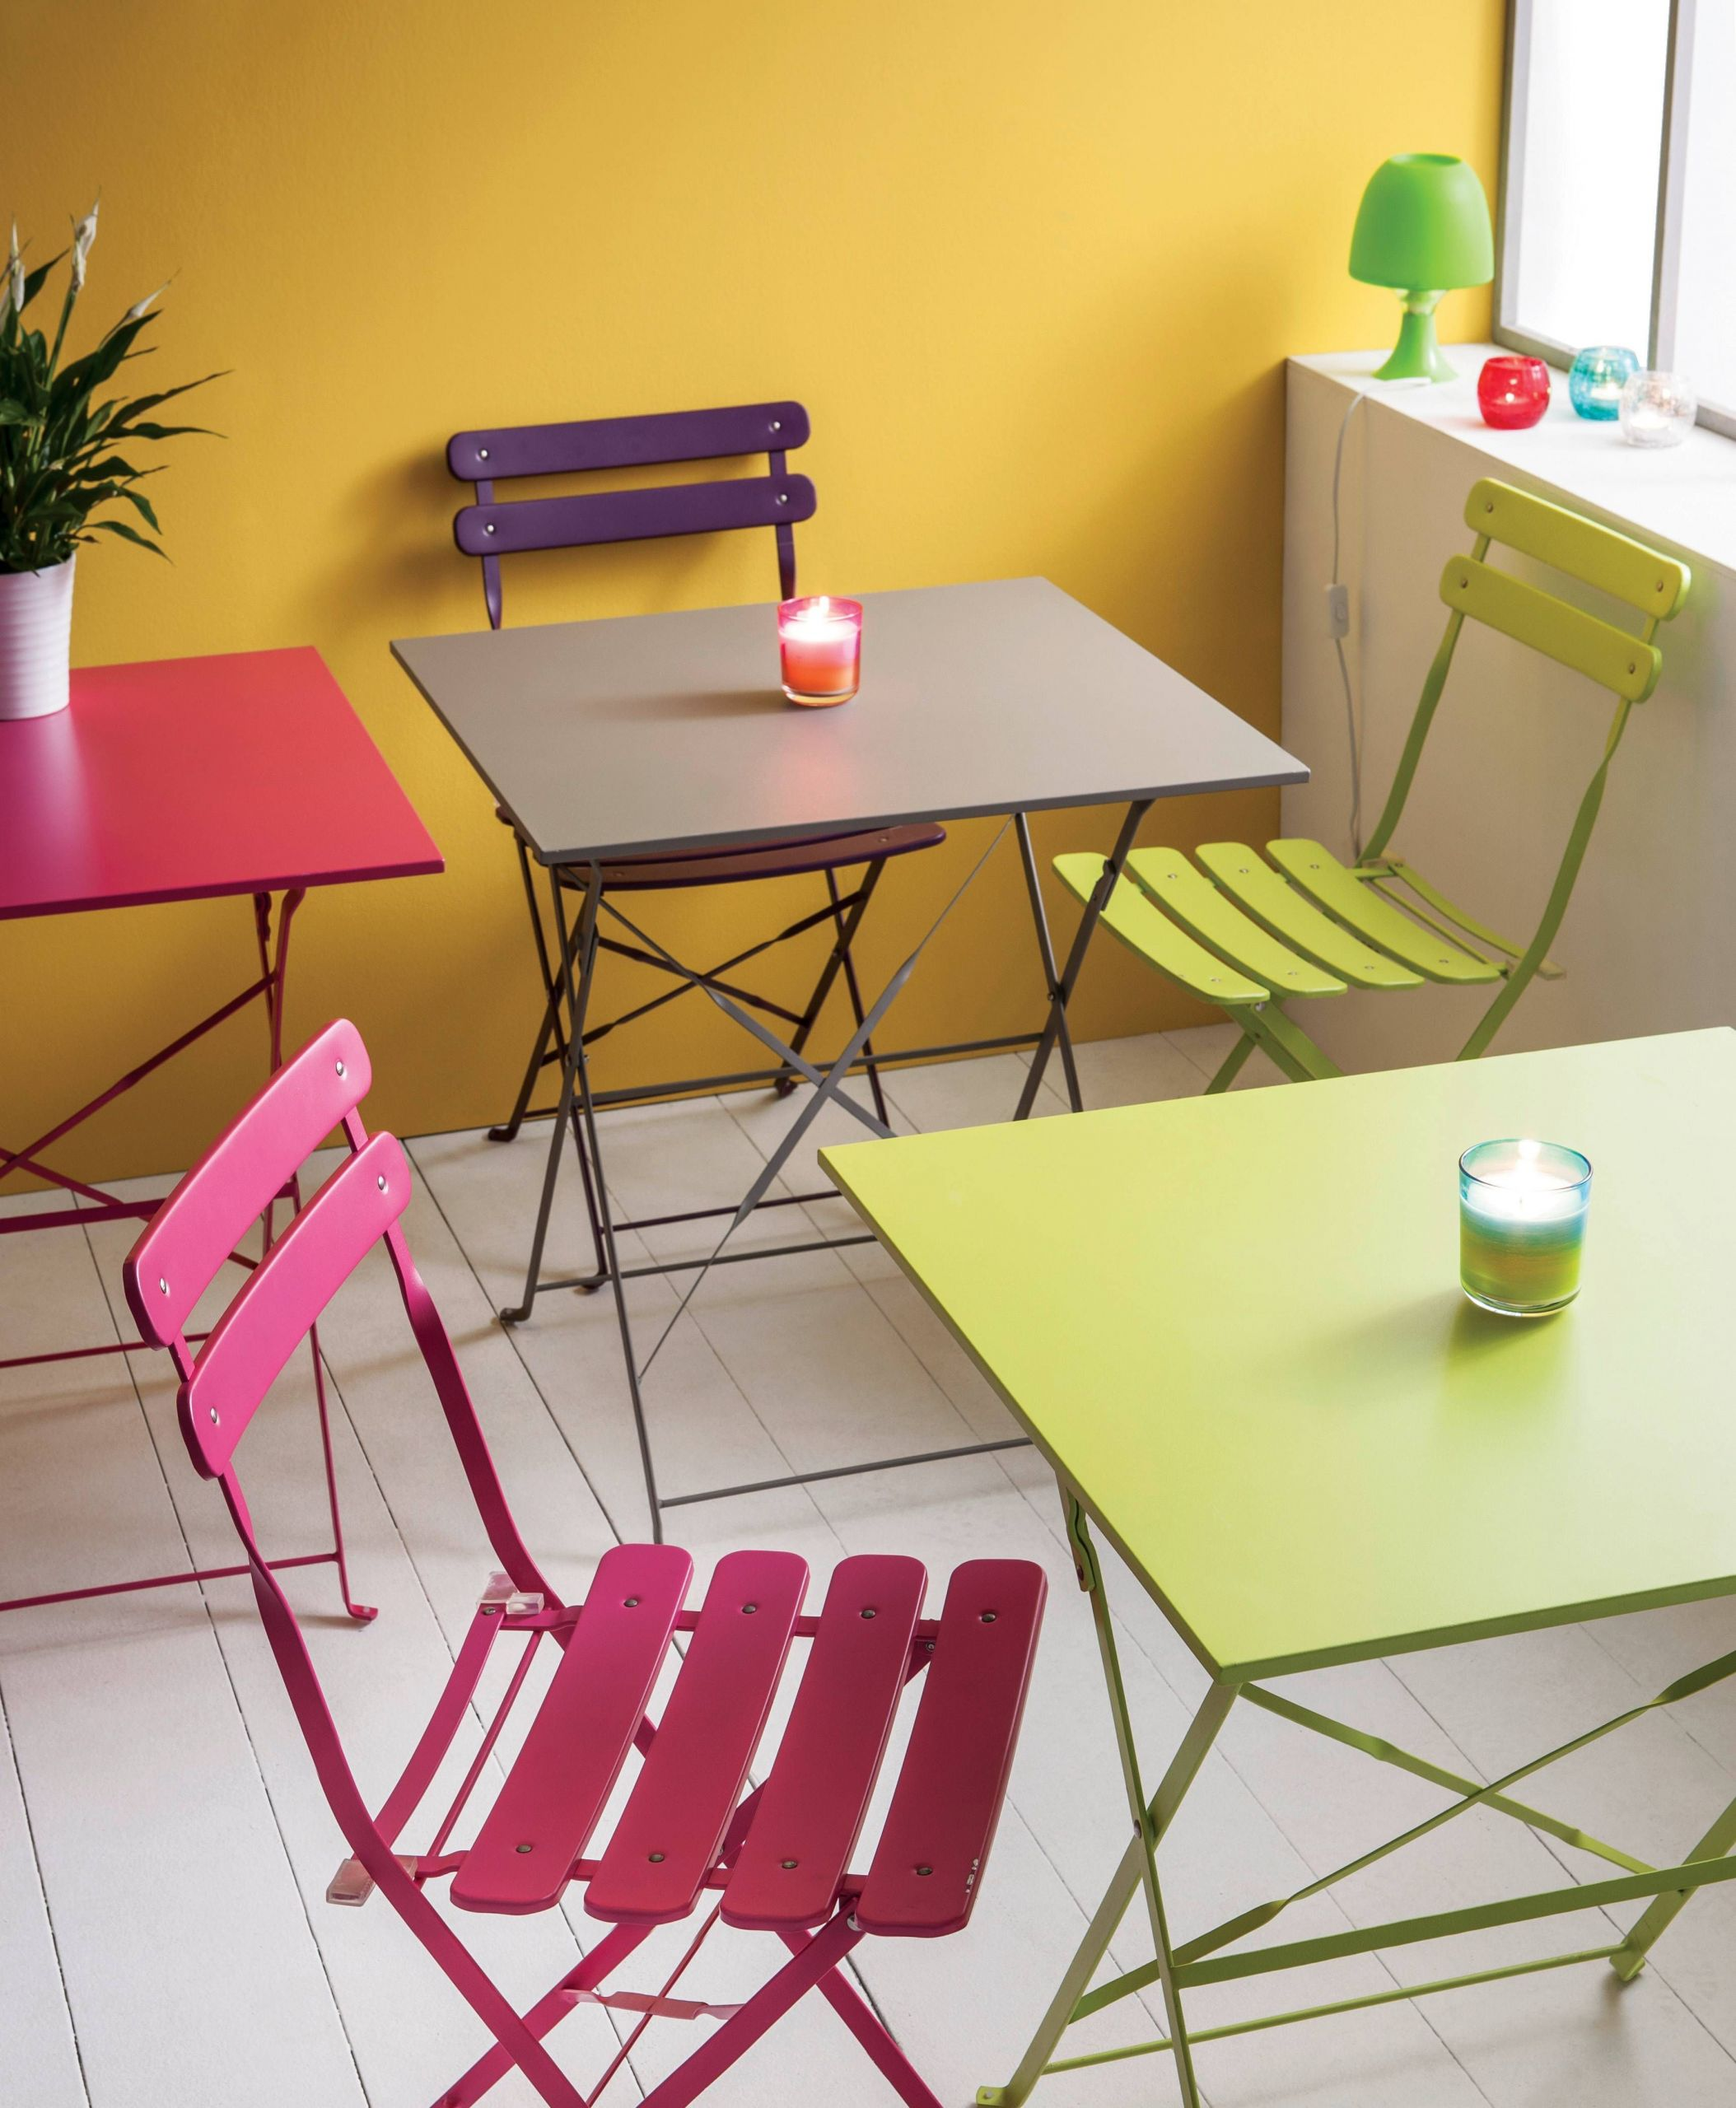 Chaise Jardin Fer Génial Table Pliante En Fer Chaise Bistrot Acier Of 31 Génial Chaise Jardin Fer